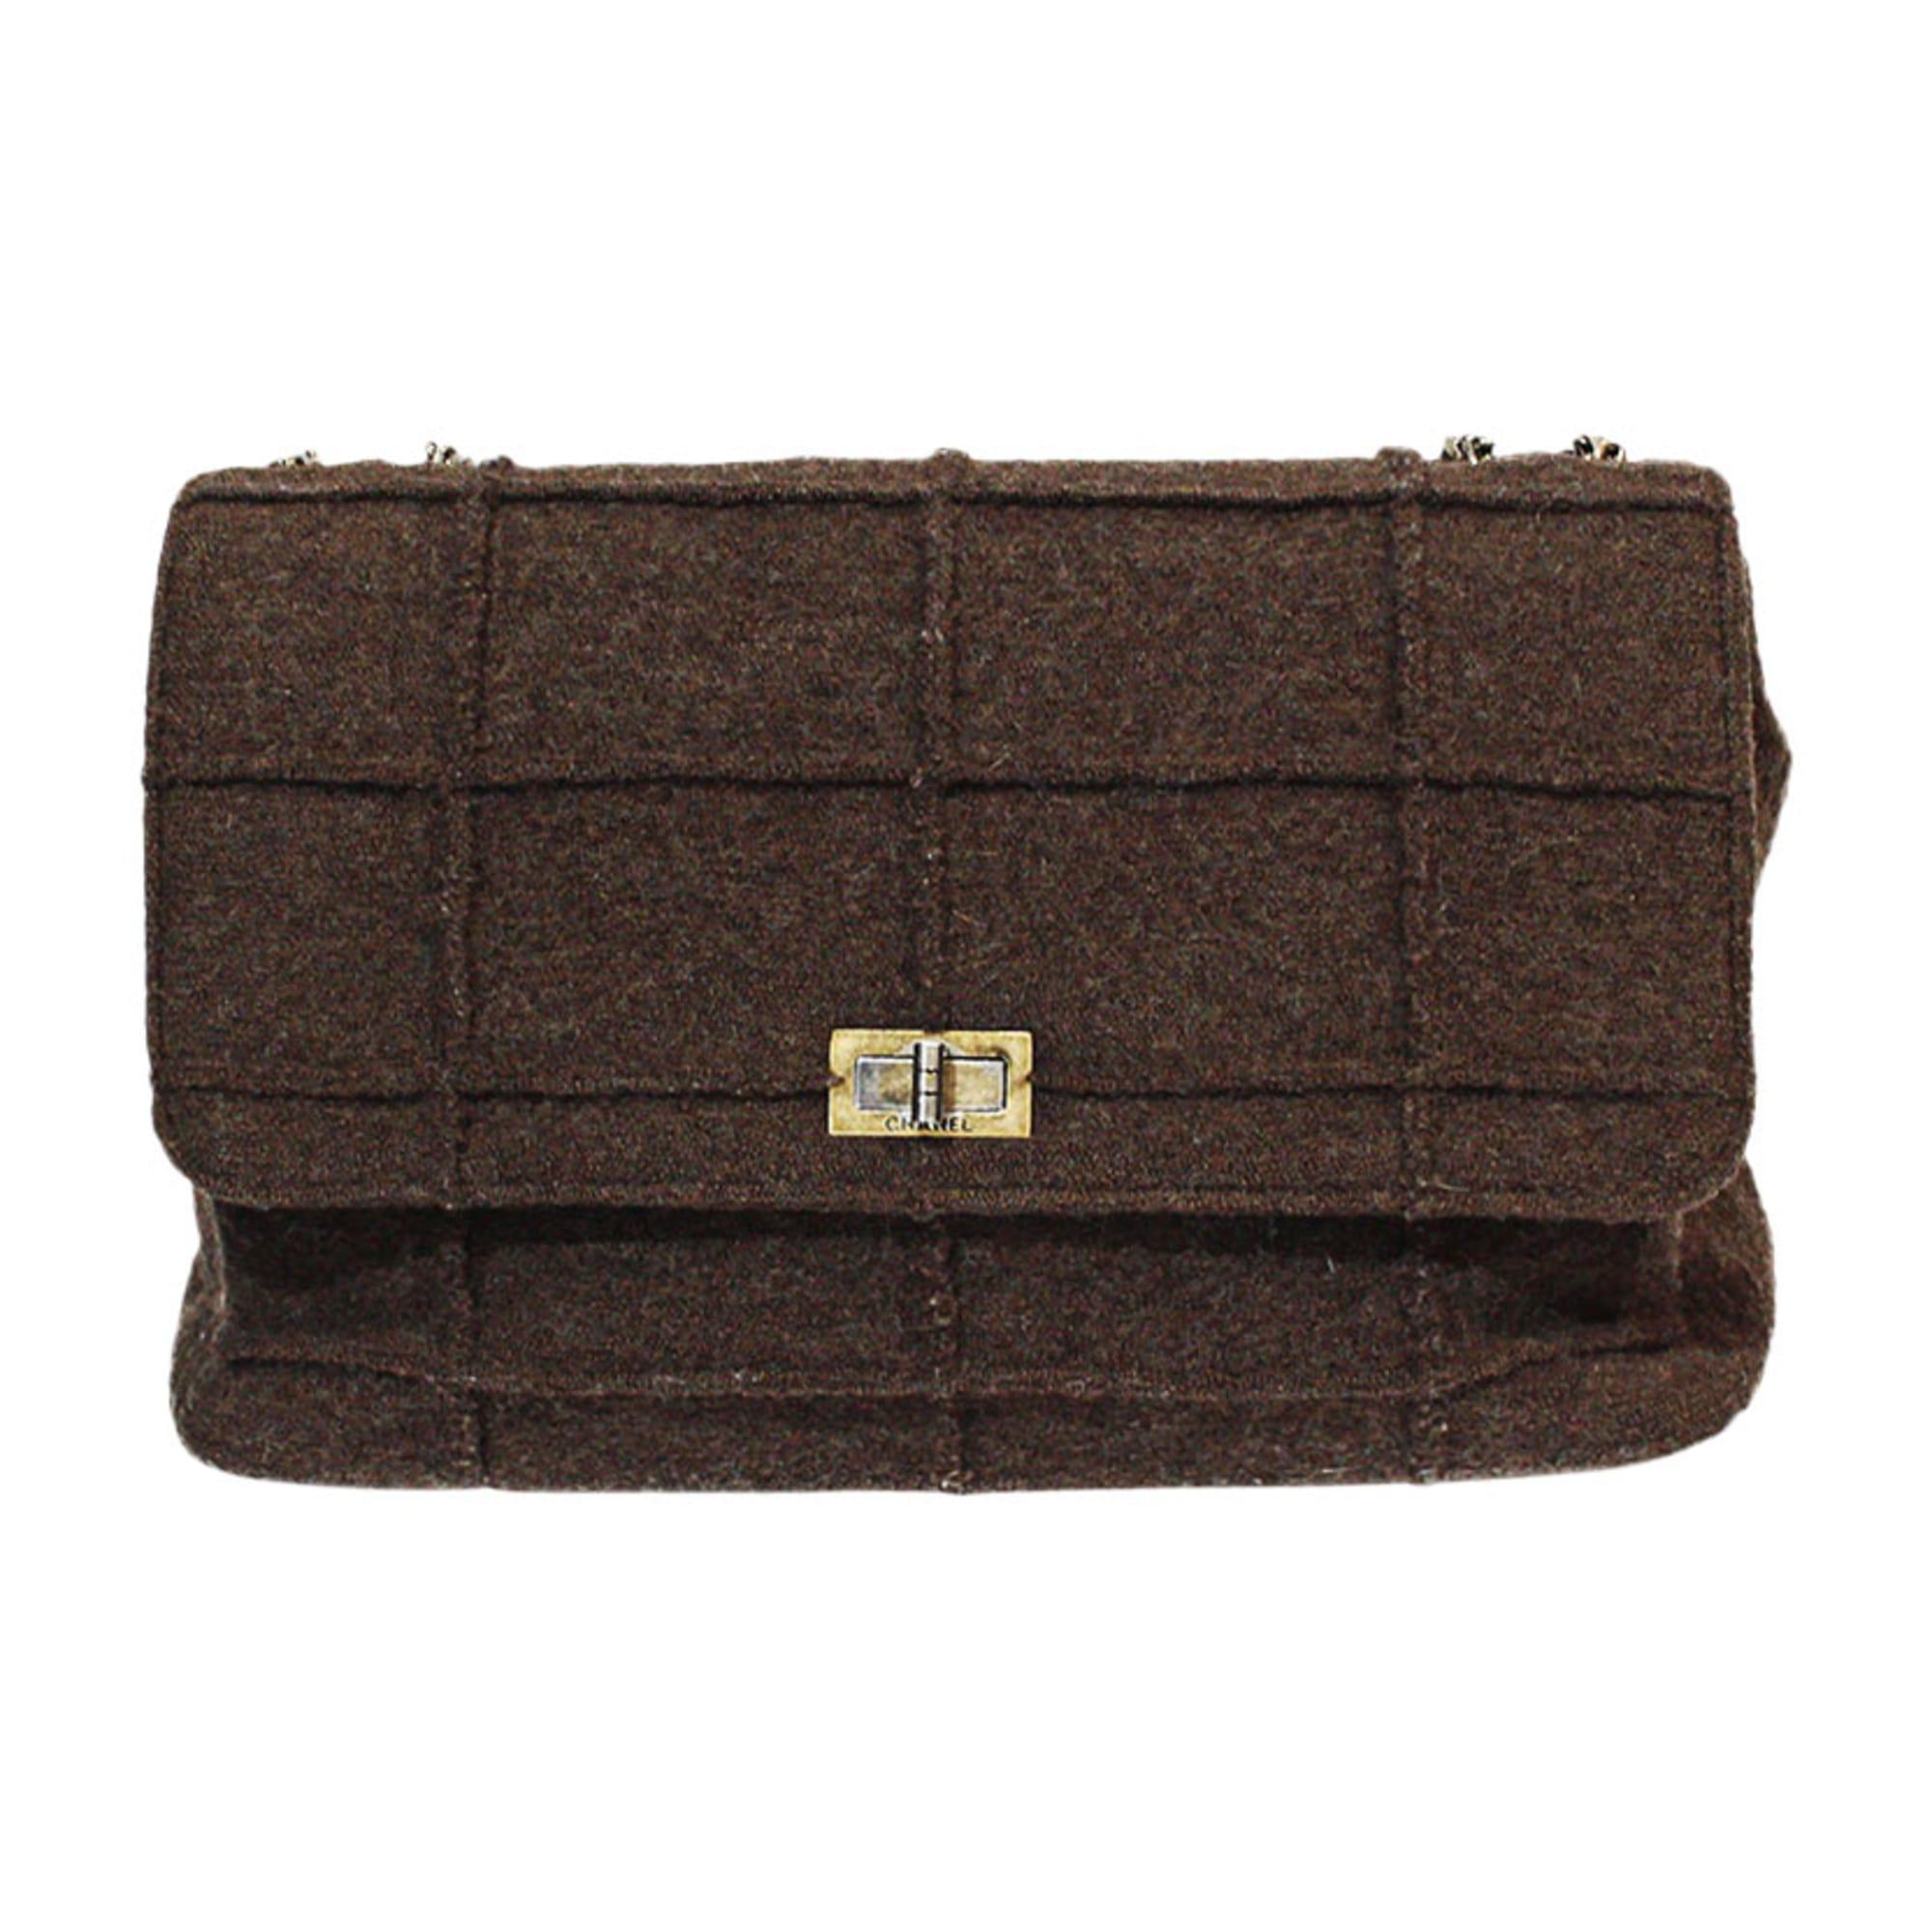 Non-Leather Shoulder Bag CHANEL Brown